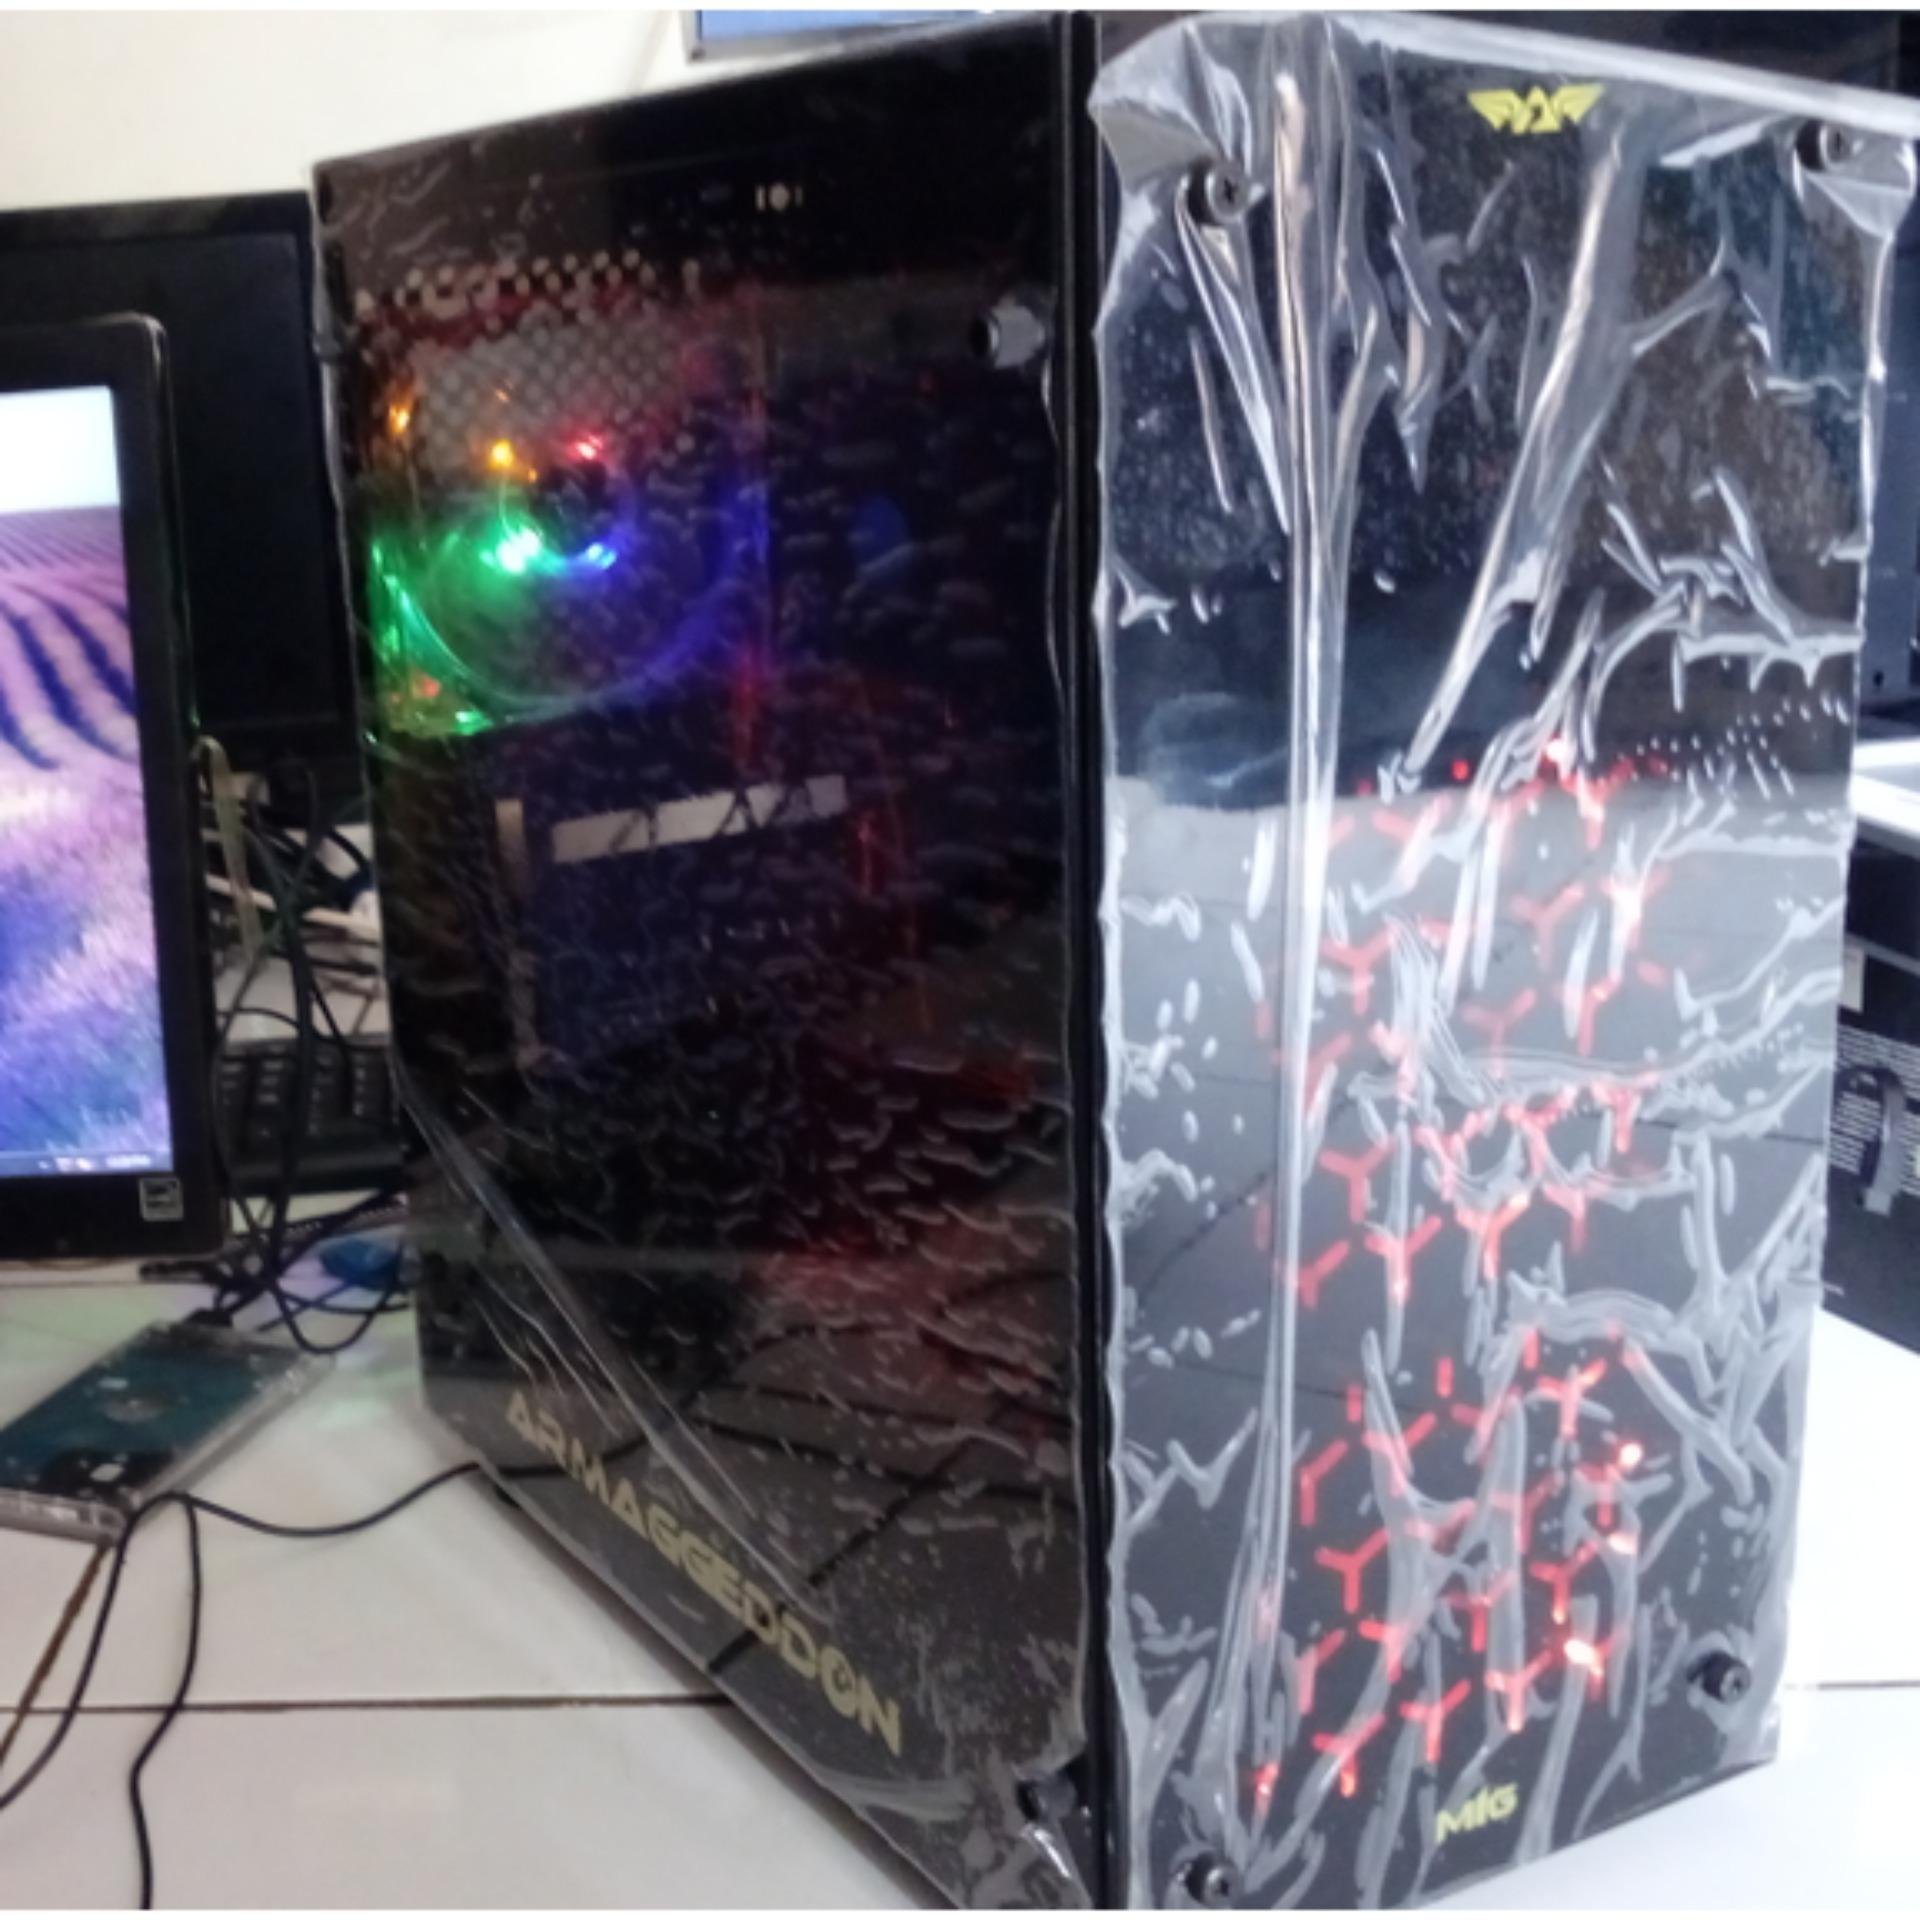 PC GAMING Online Dan Design AMD A8-5600 3.9GHz Quad Core